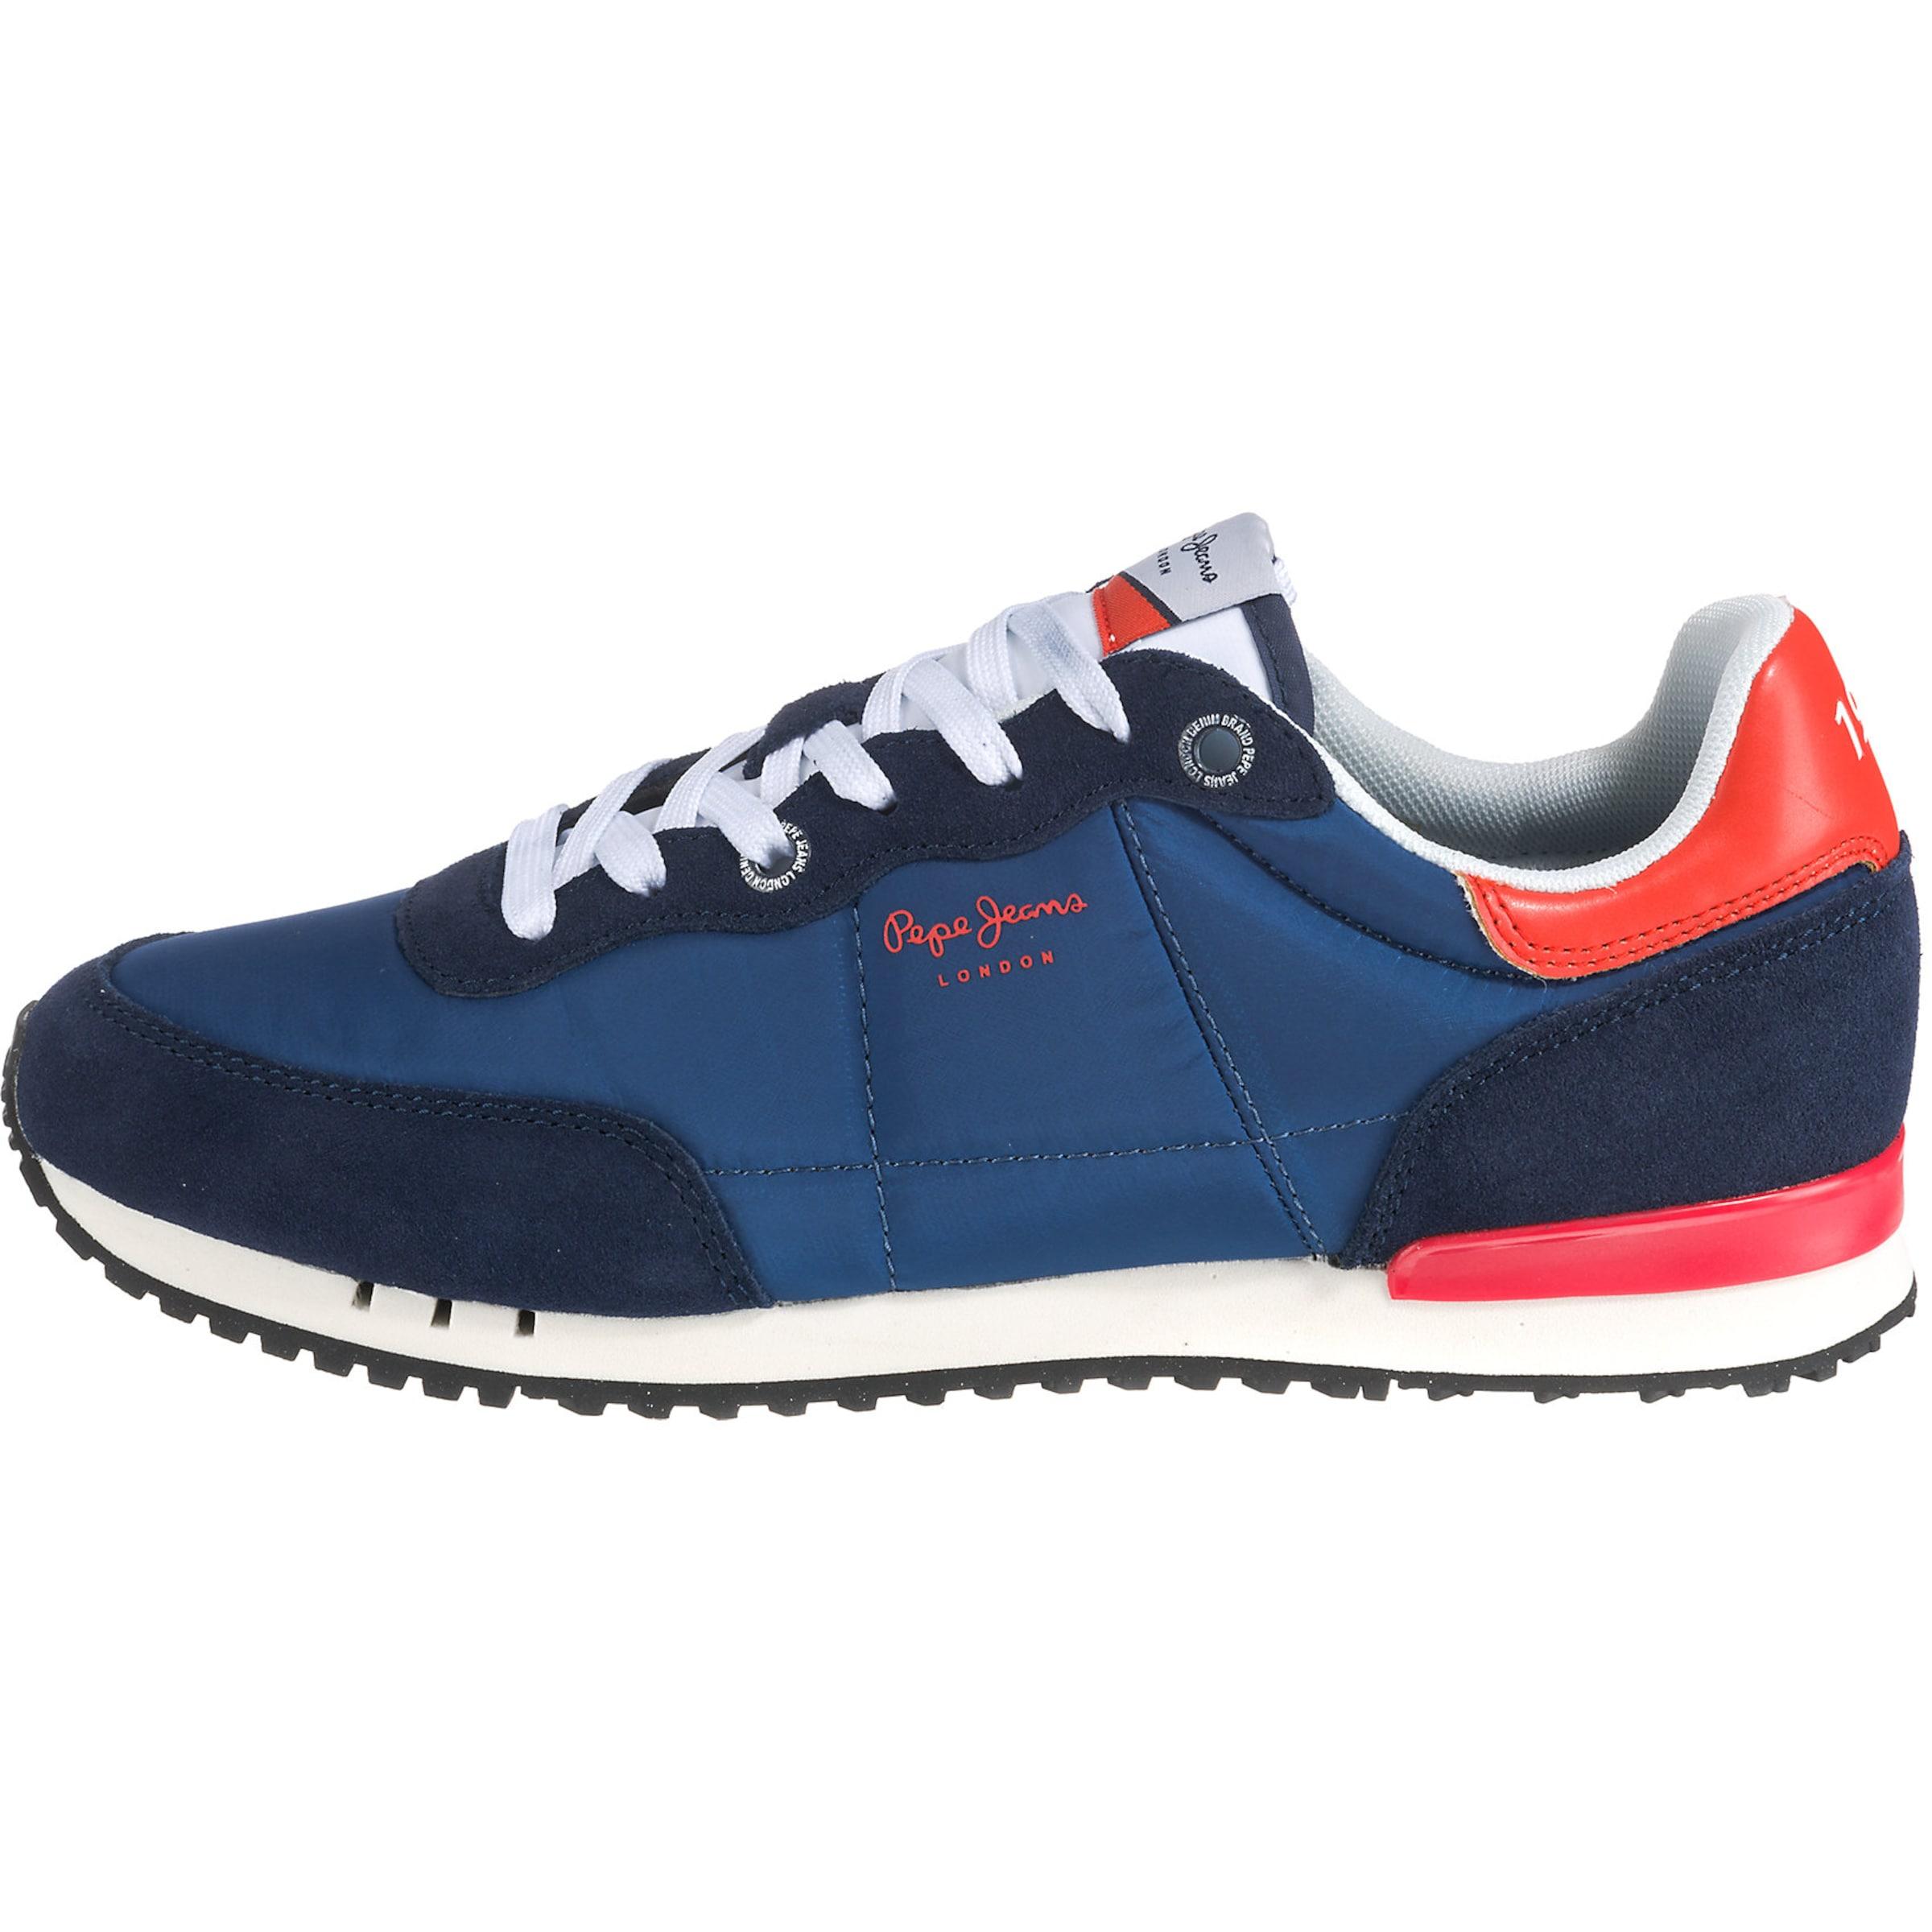 Pepe 'tinker' BlauNavy Hellrot Jeans In Sneaker pUMSzV